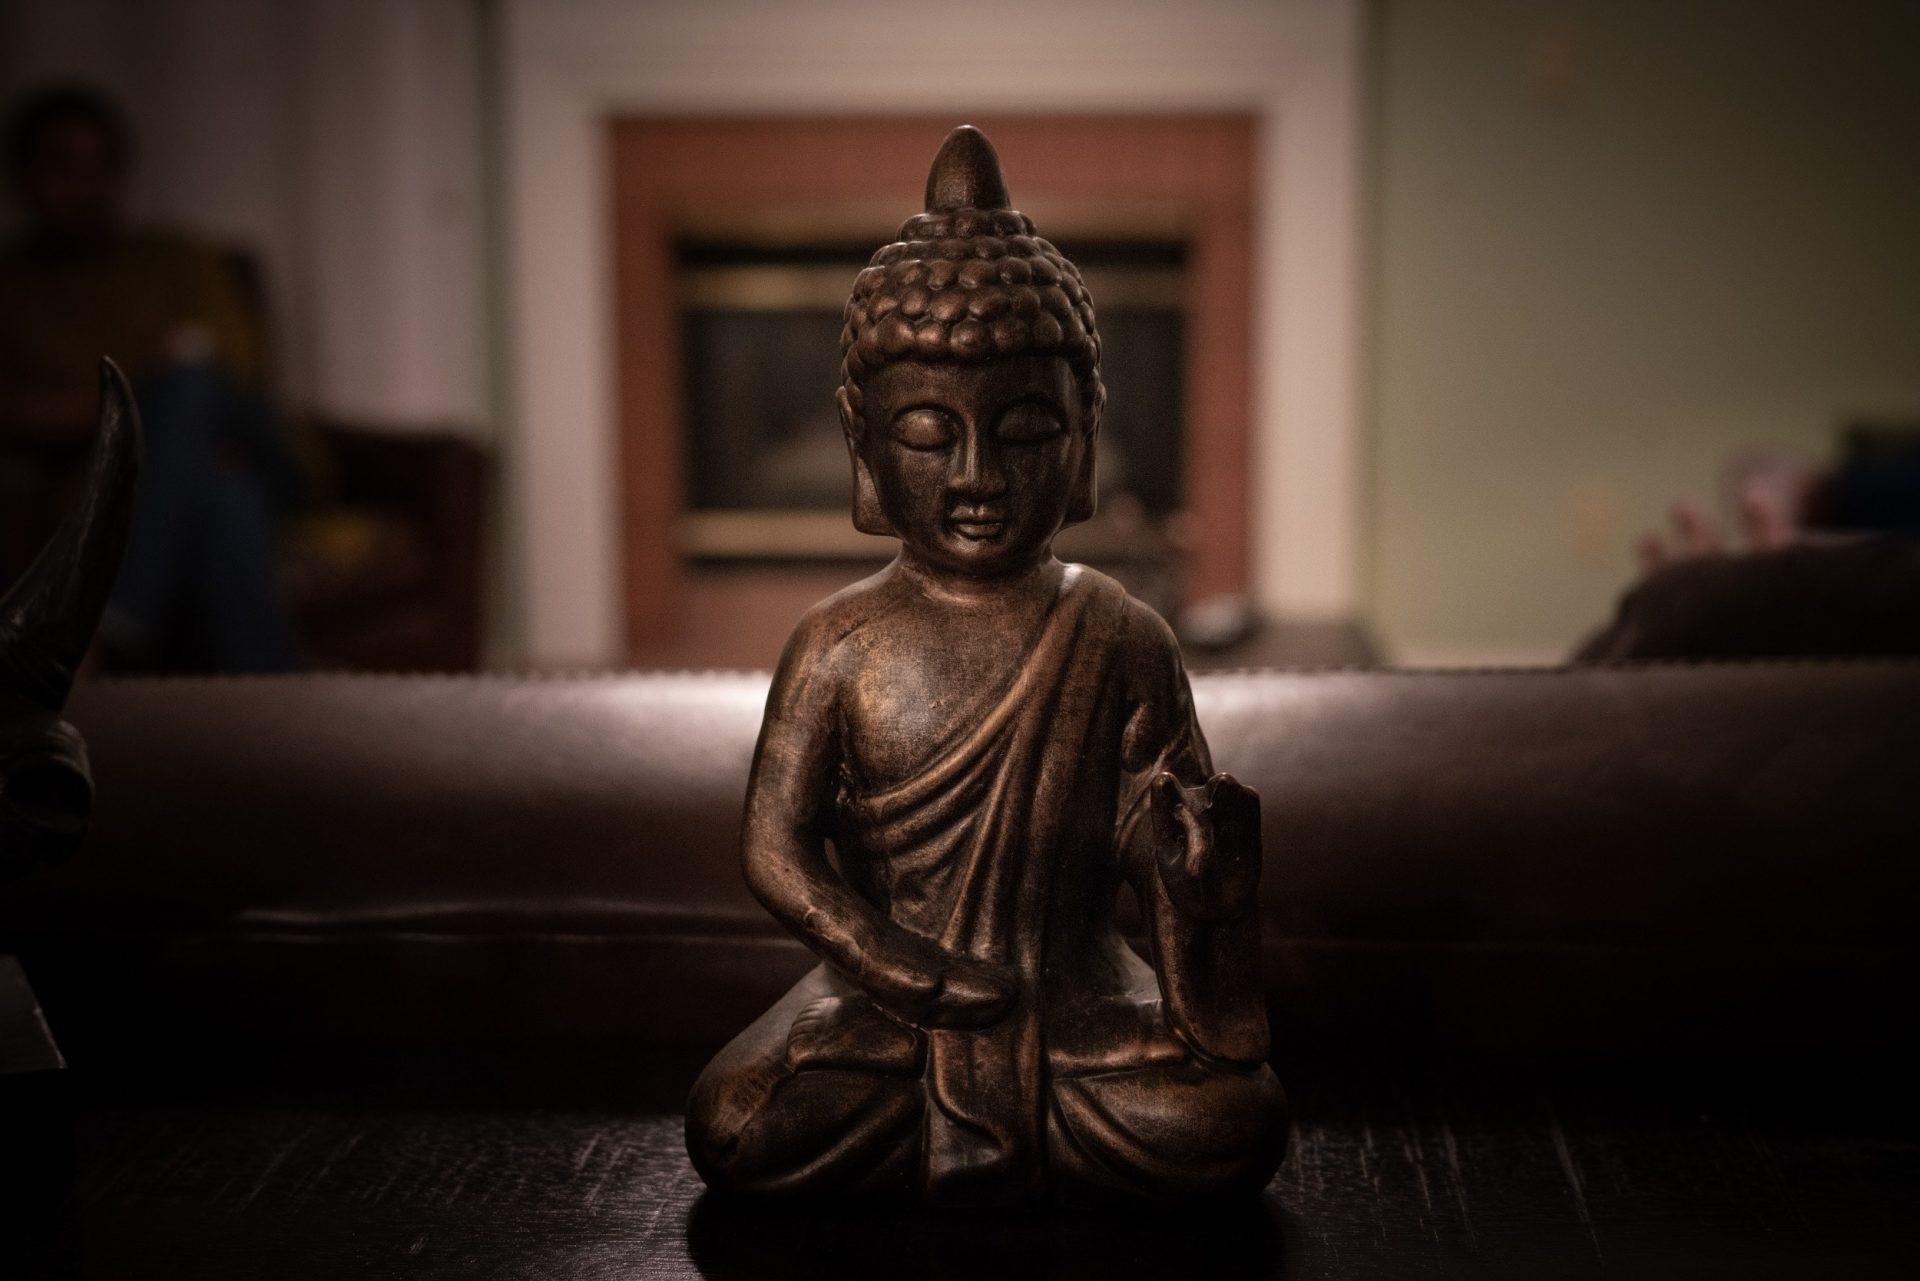 brass buddha figurine on black surface 1585716